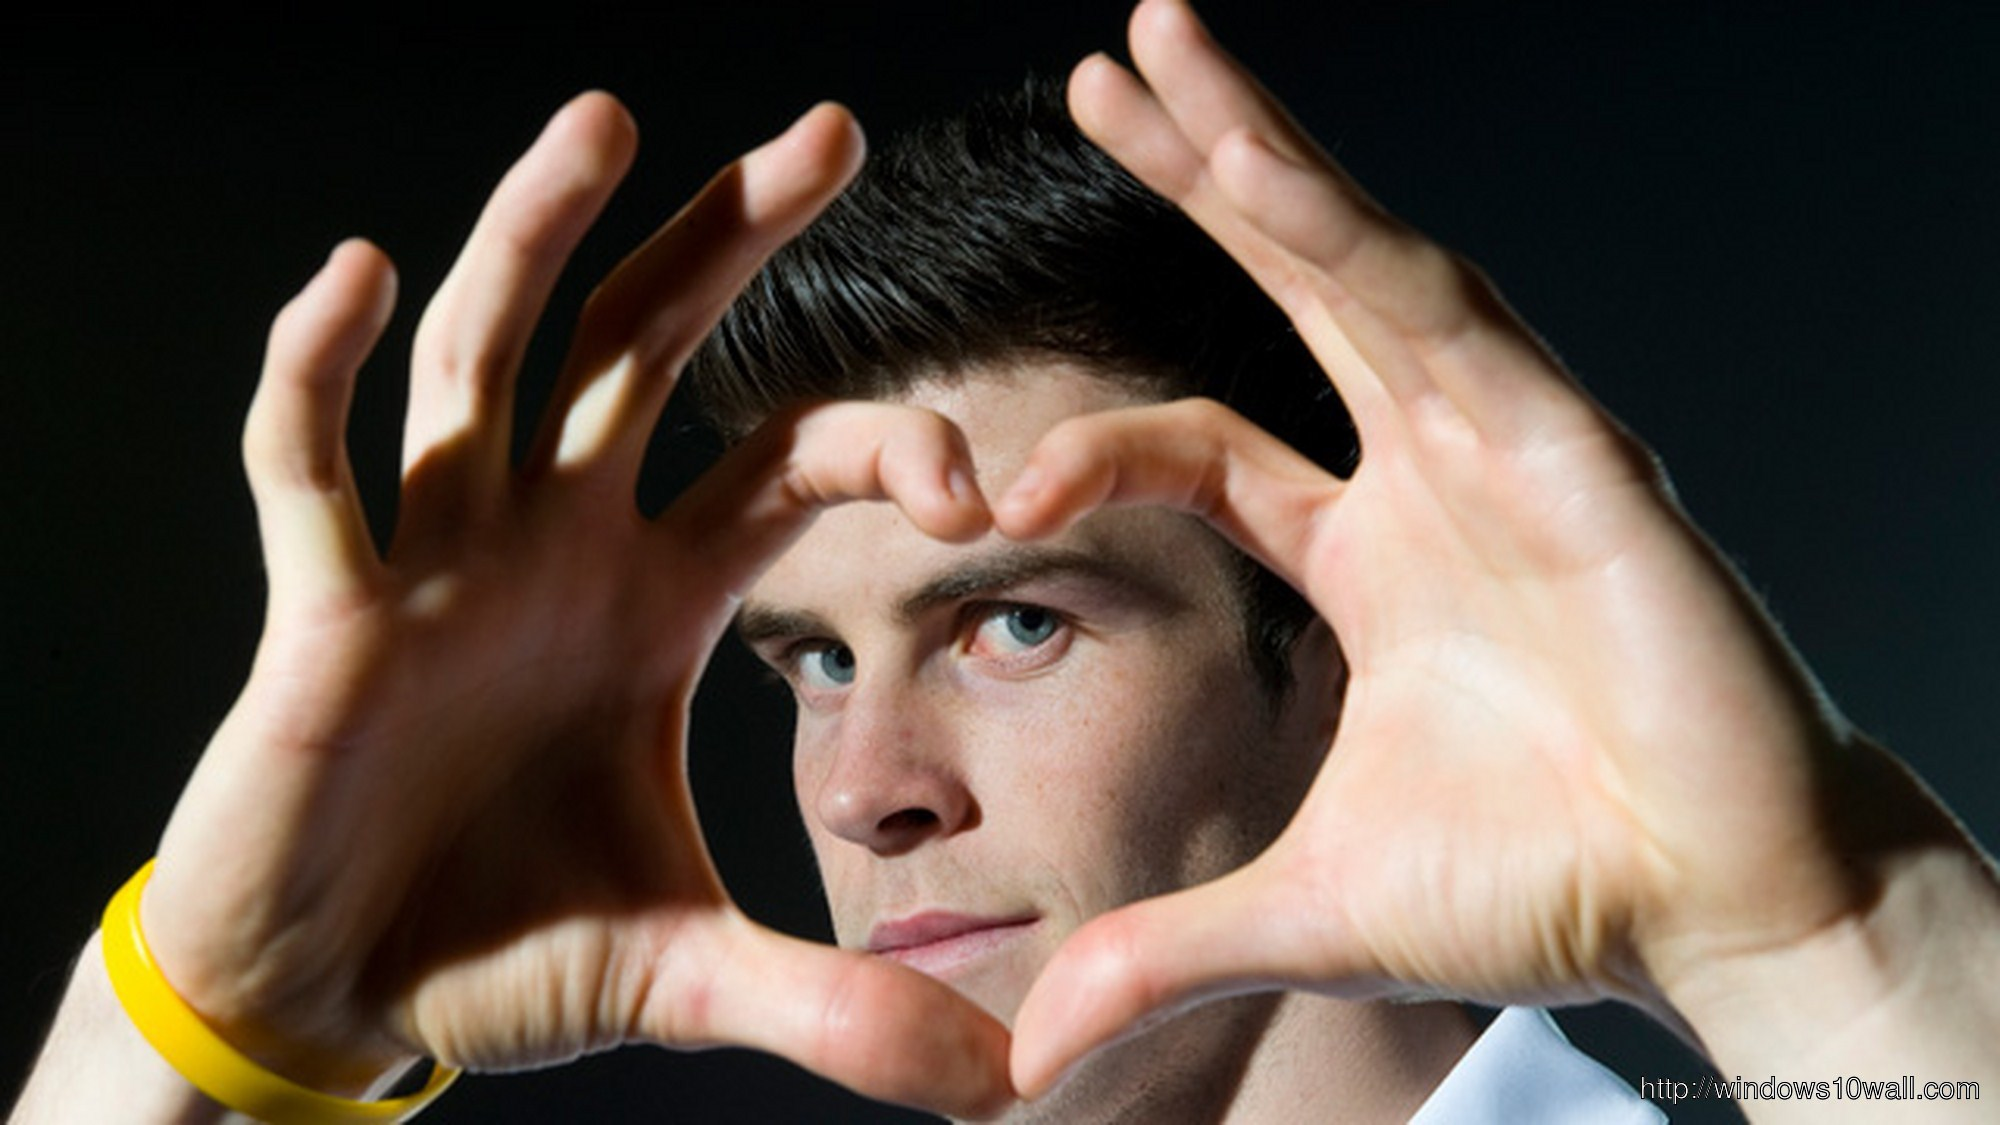 Gareth Bale Making Heart Shape with Hands Wallpaper